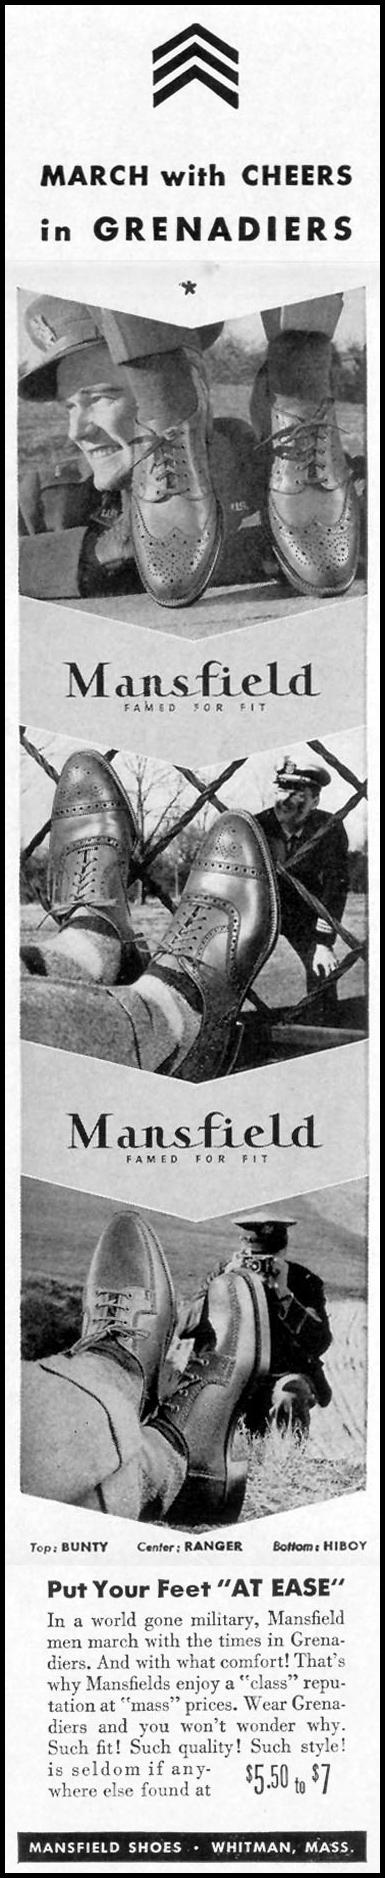 MANSFIELD GRENADIERS LIFE 10/13/1941 p. 149